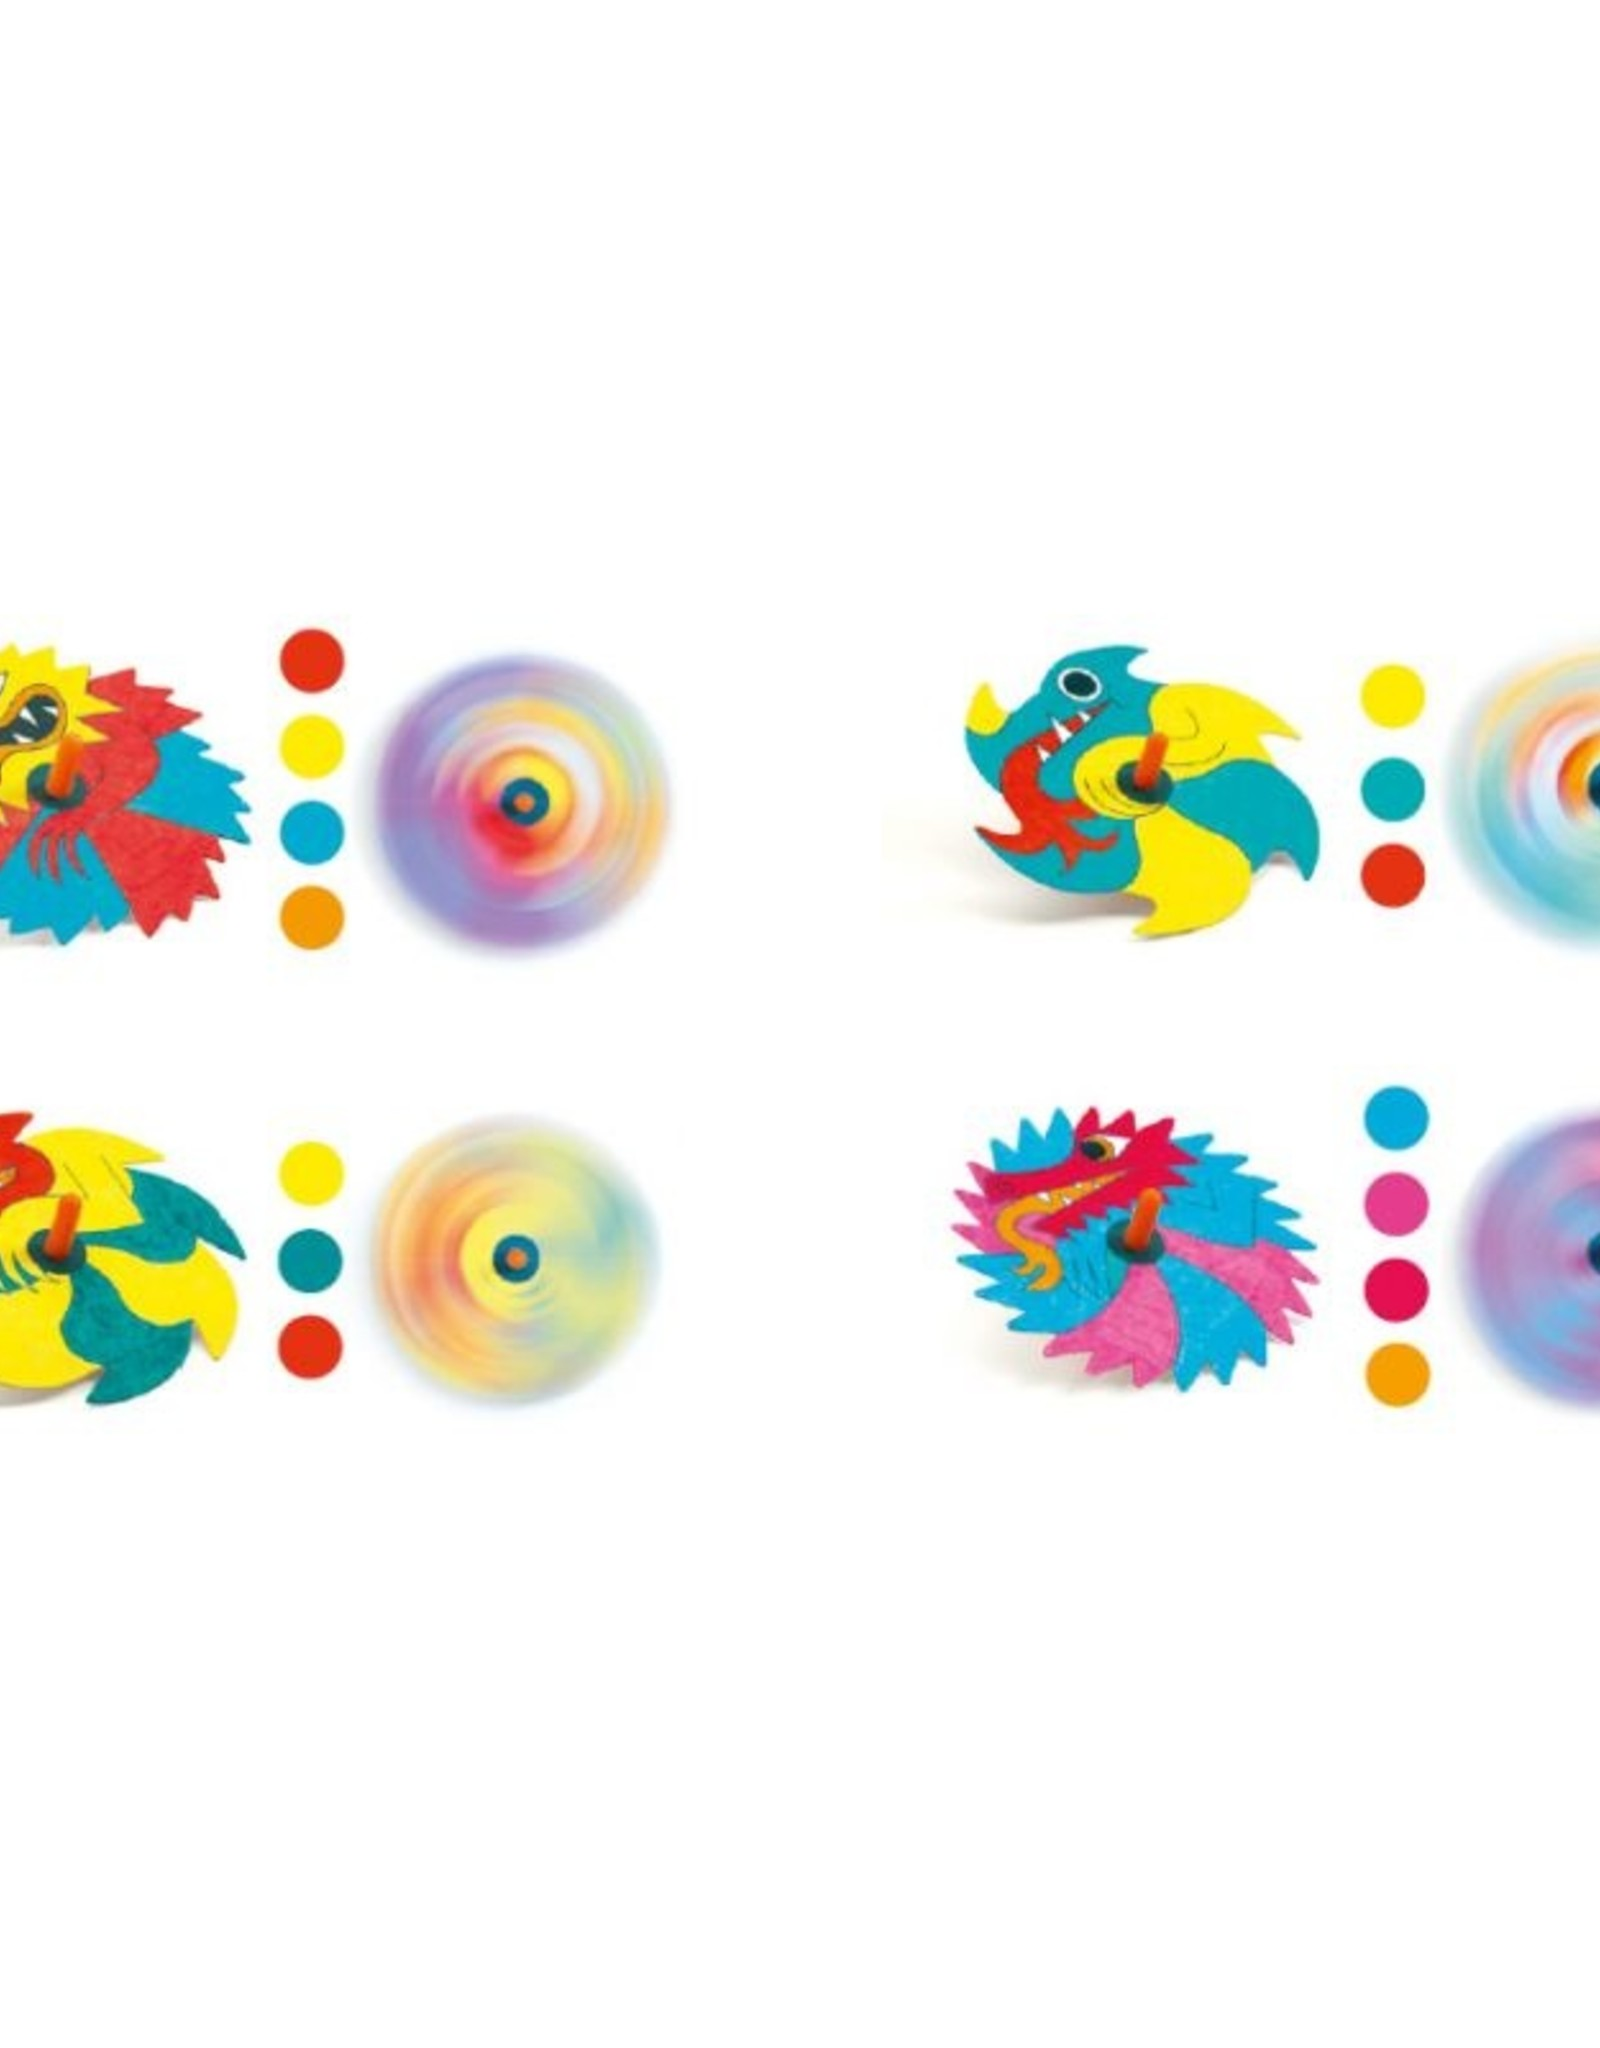 Djeco Spinning Tops DIY - Dragons